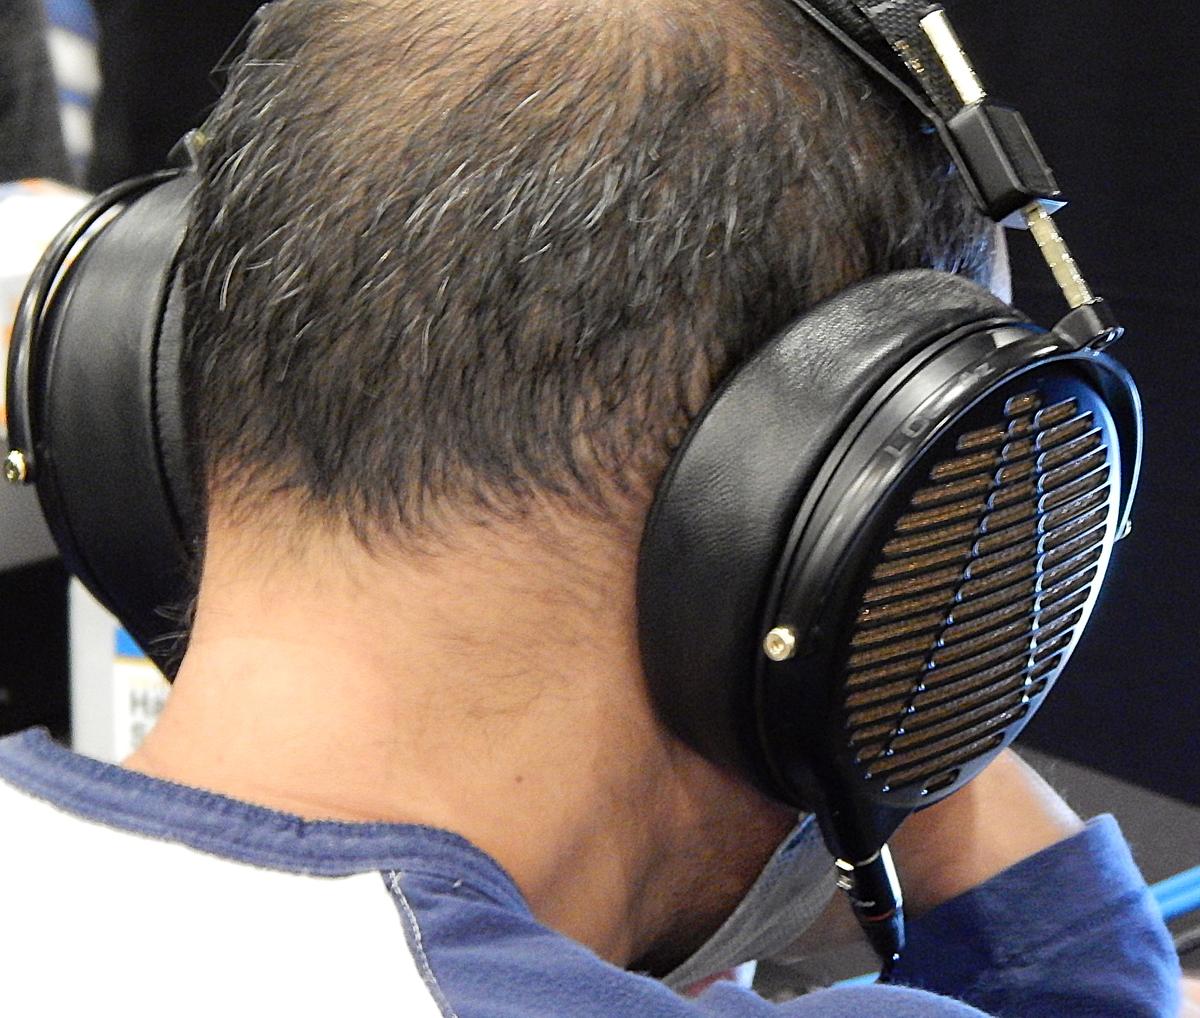 Audeze LCD-4z Planar Magnetic Headphones CanJam SoCal 2021